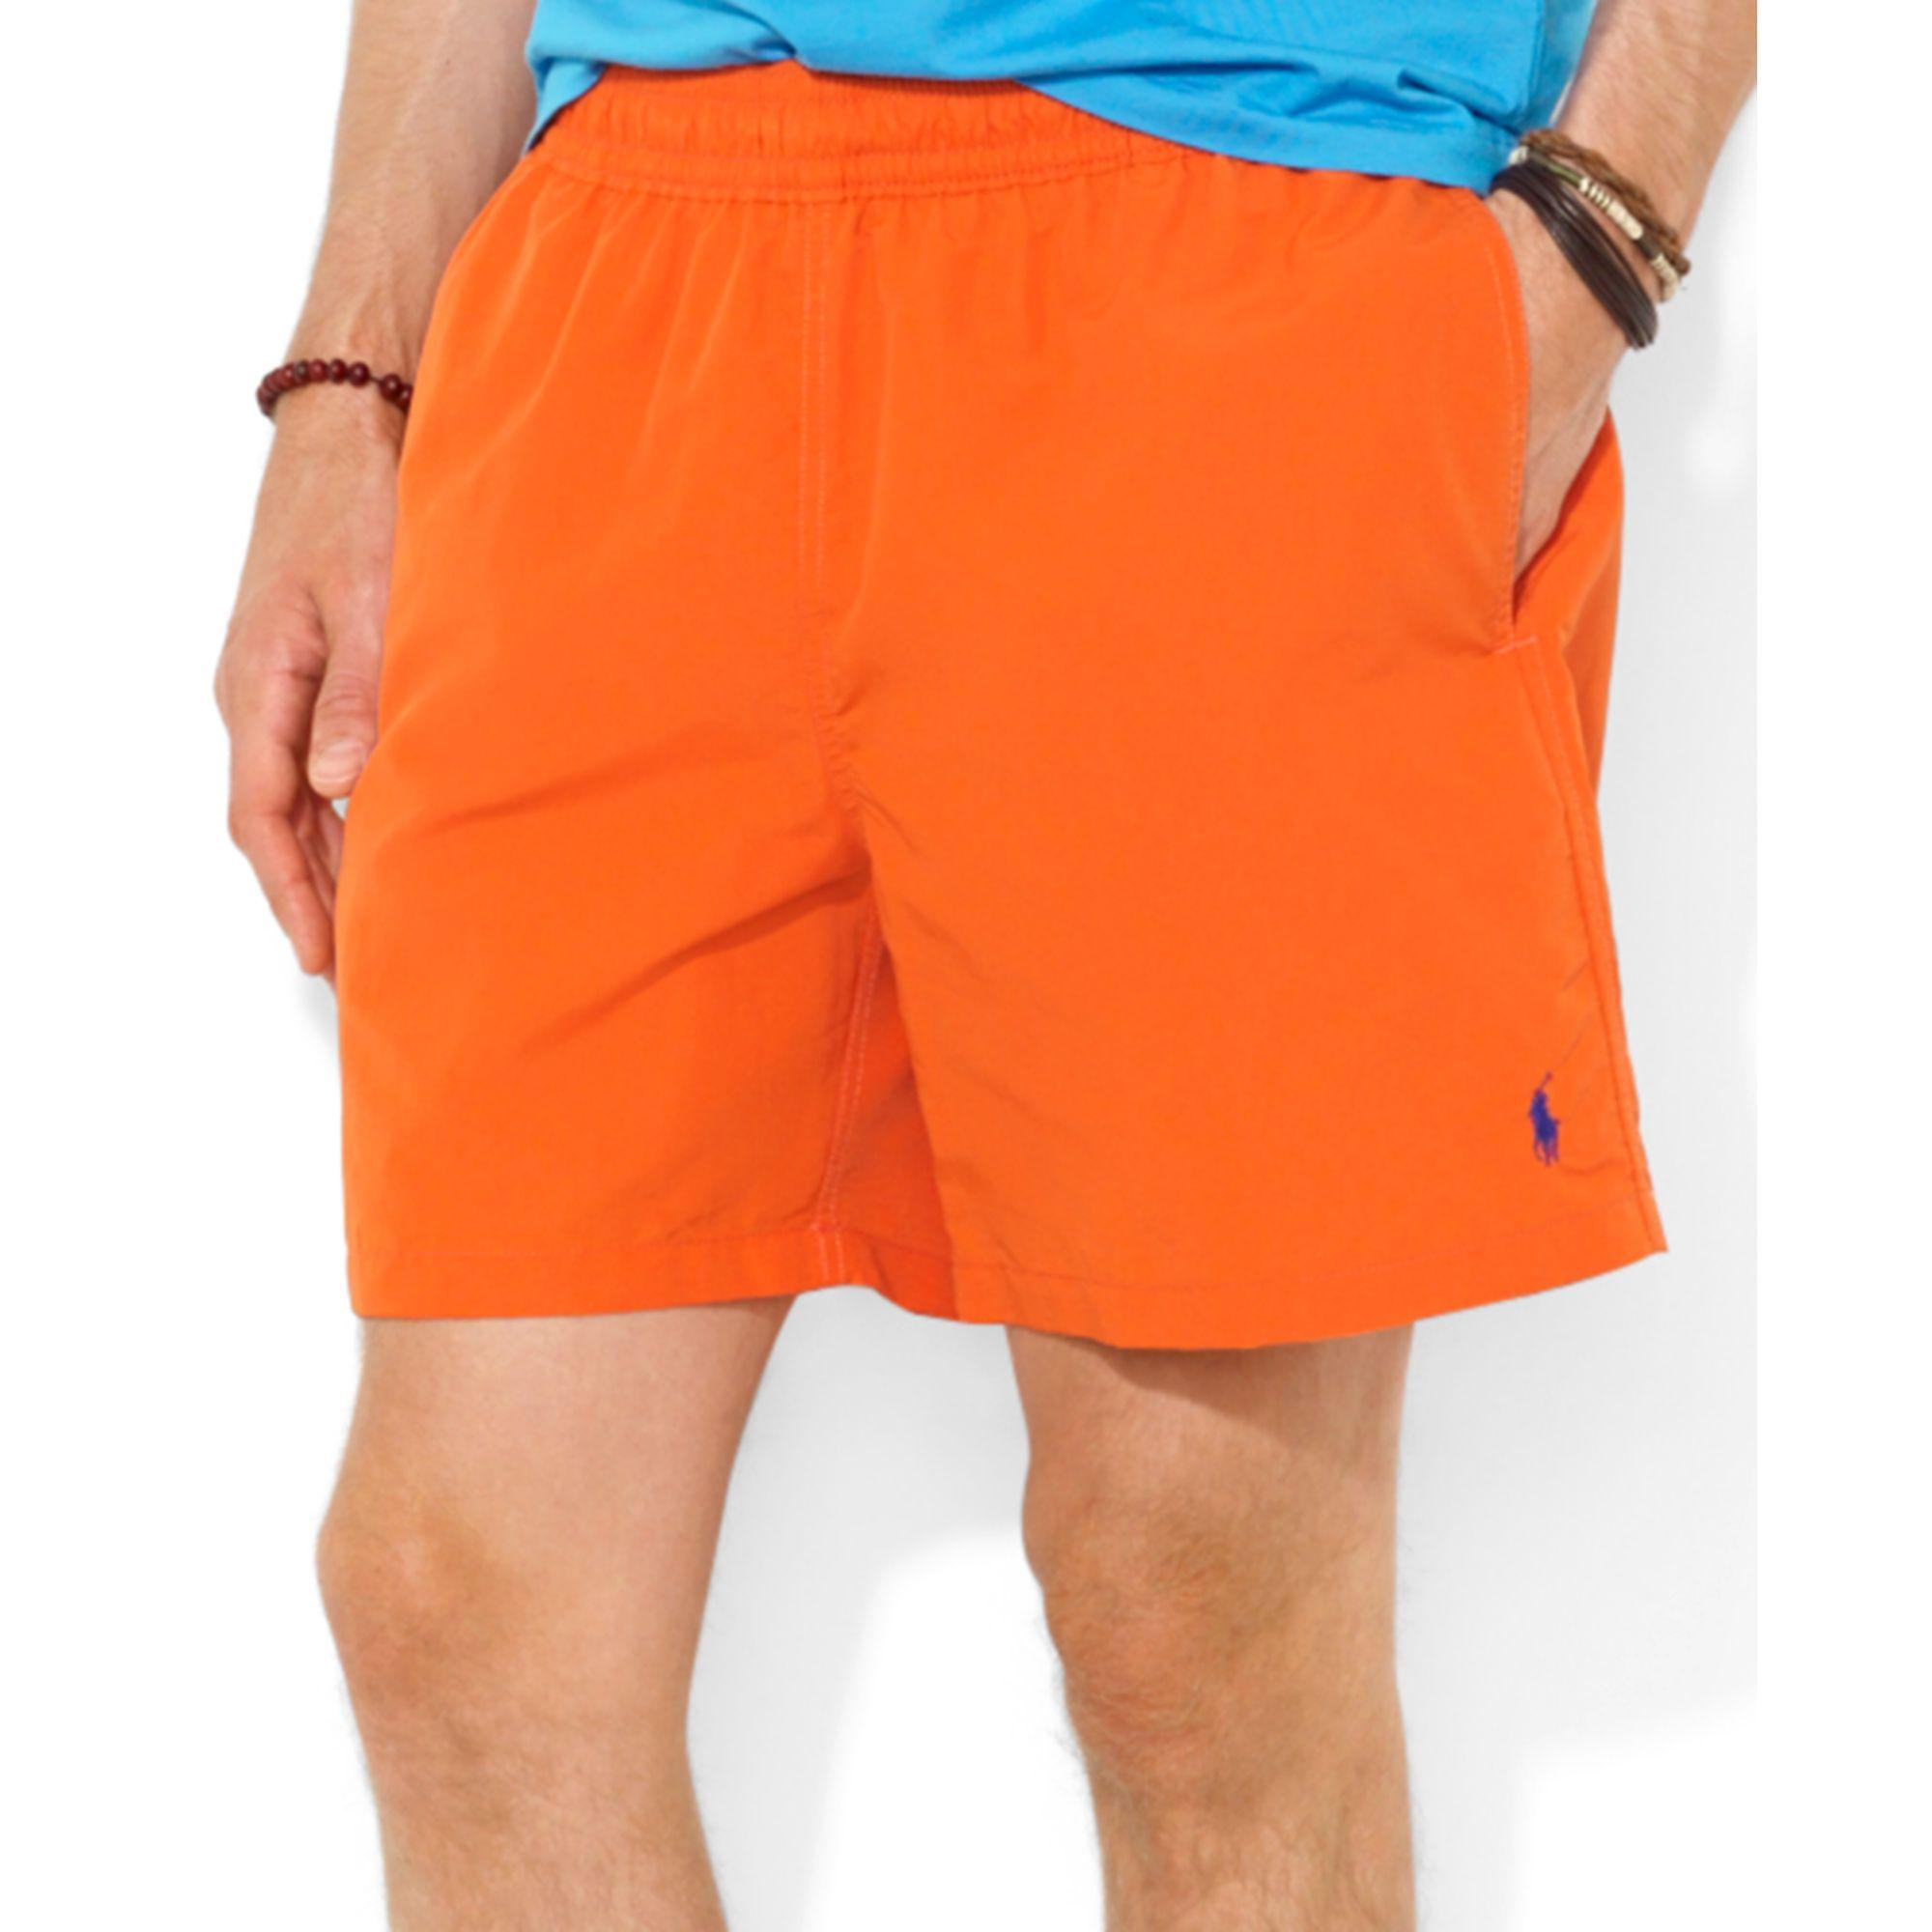 e5f769a052 Lyst - Ralph Lauren Polo Hawaiian Solid Swim Boxer in Orange for Men